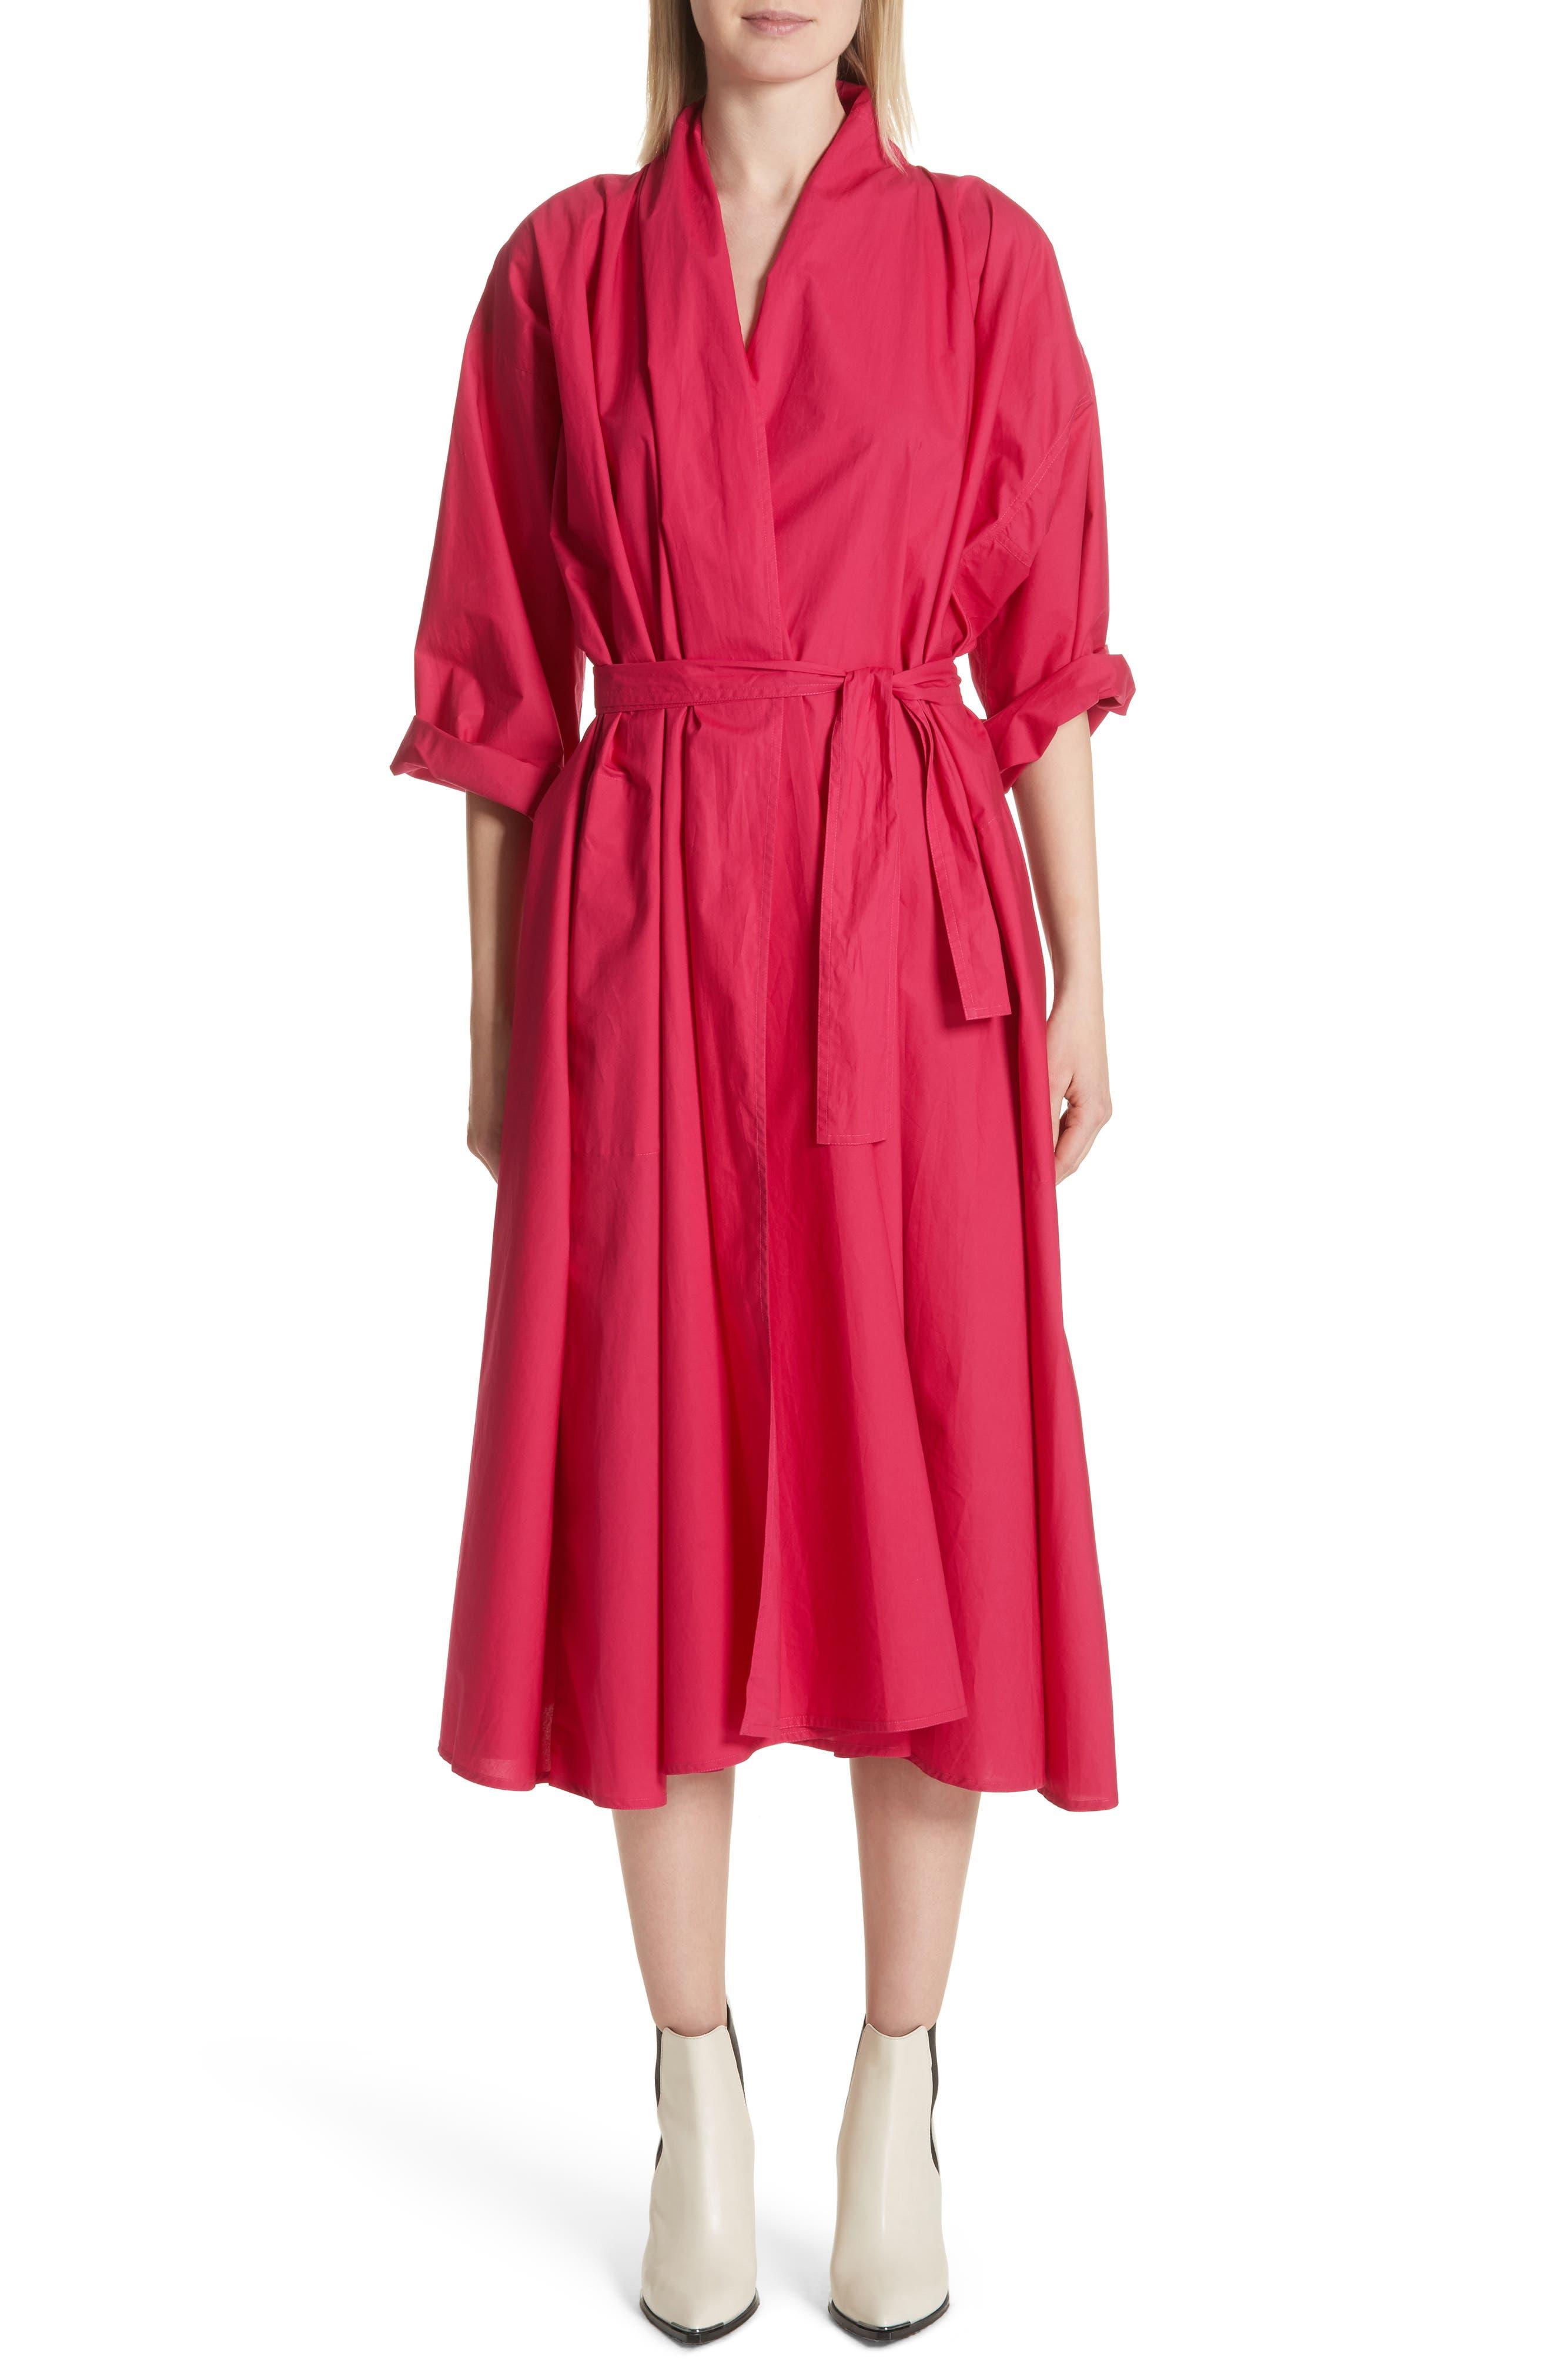 Sofie D'Hoore Gathered Sleeve Dress